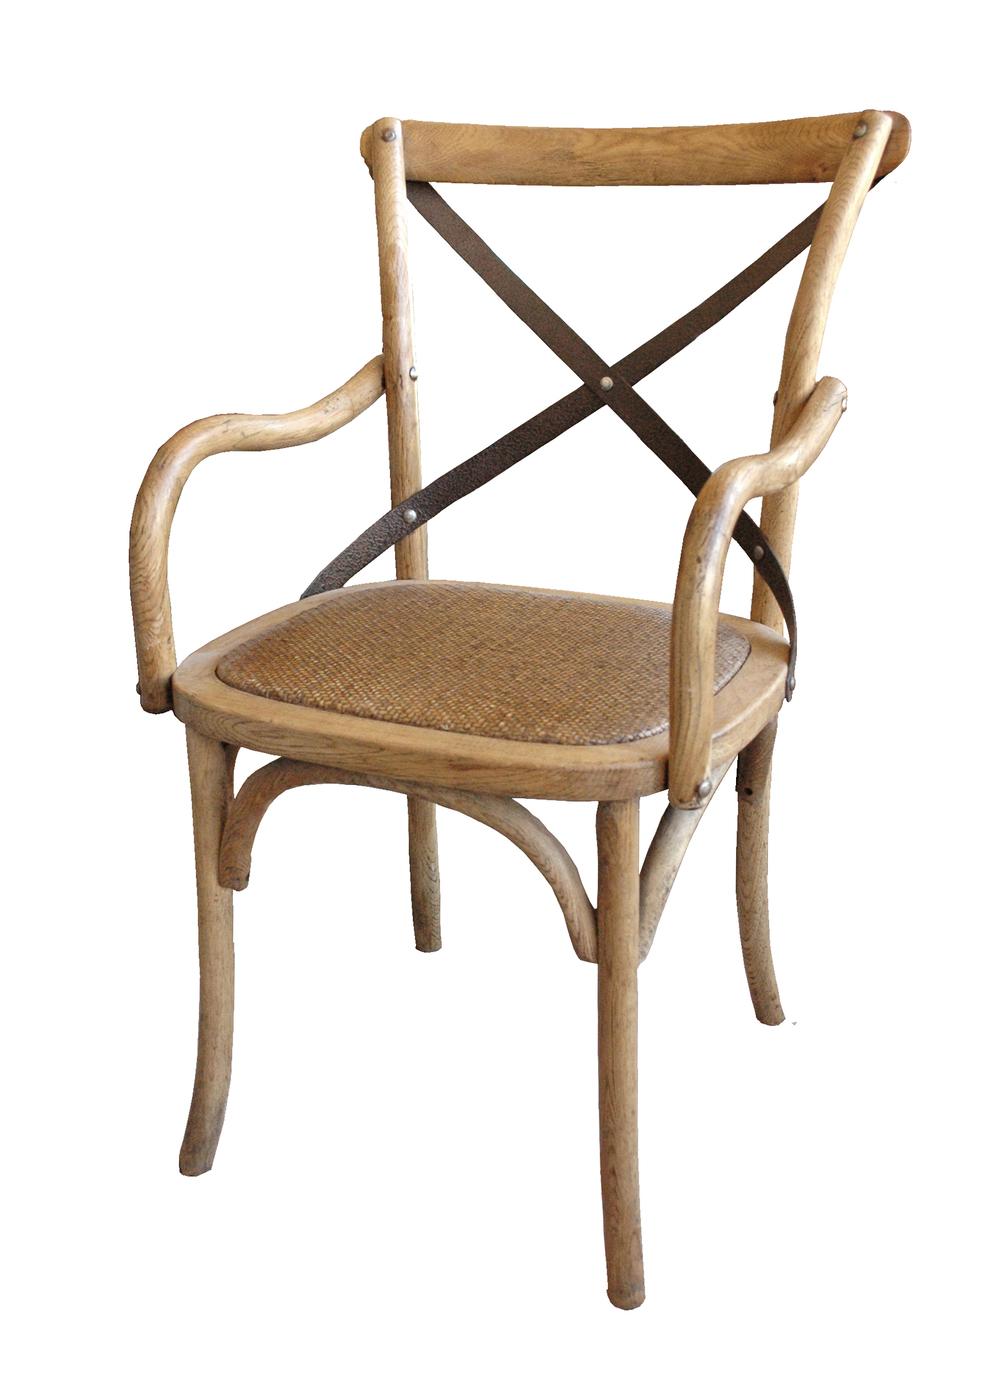 GJ Styles - Cross Arm Chair with Metal Cross